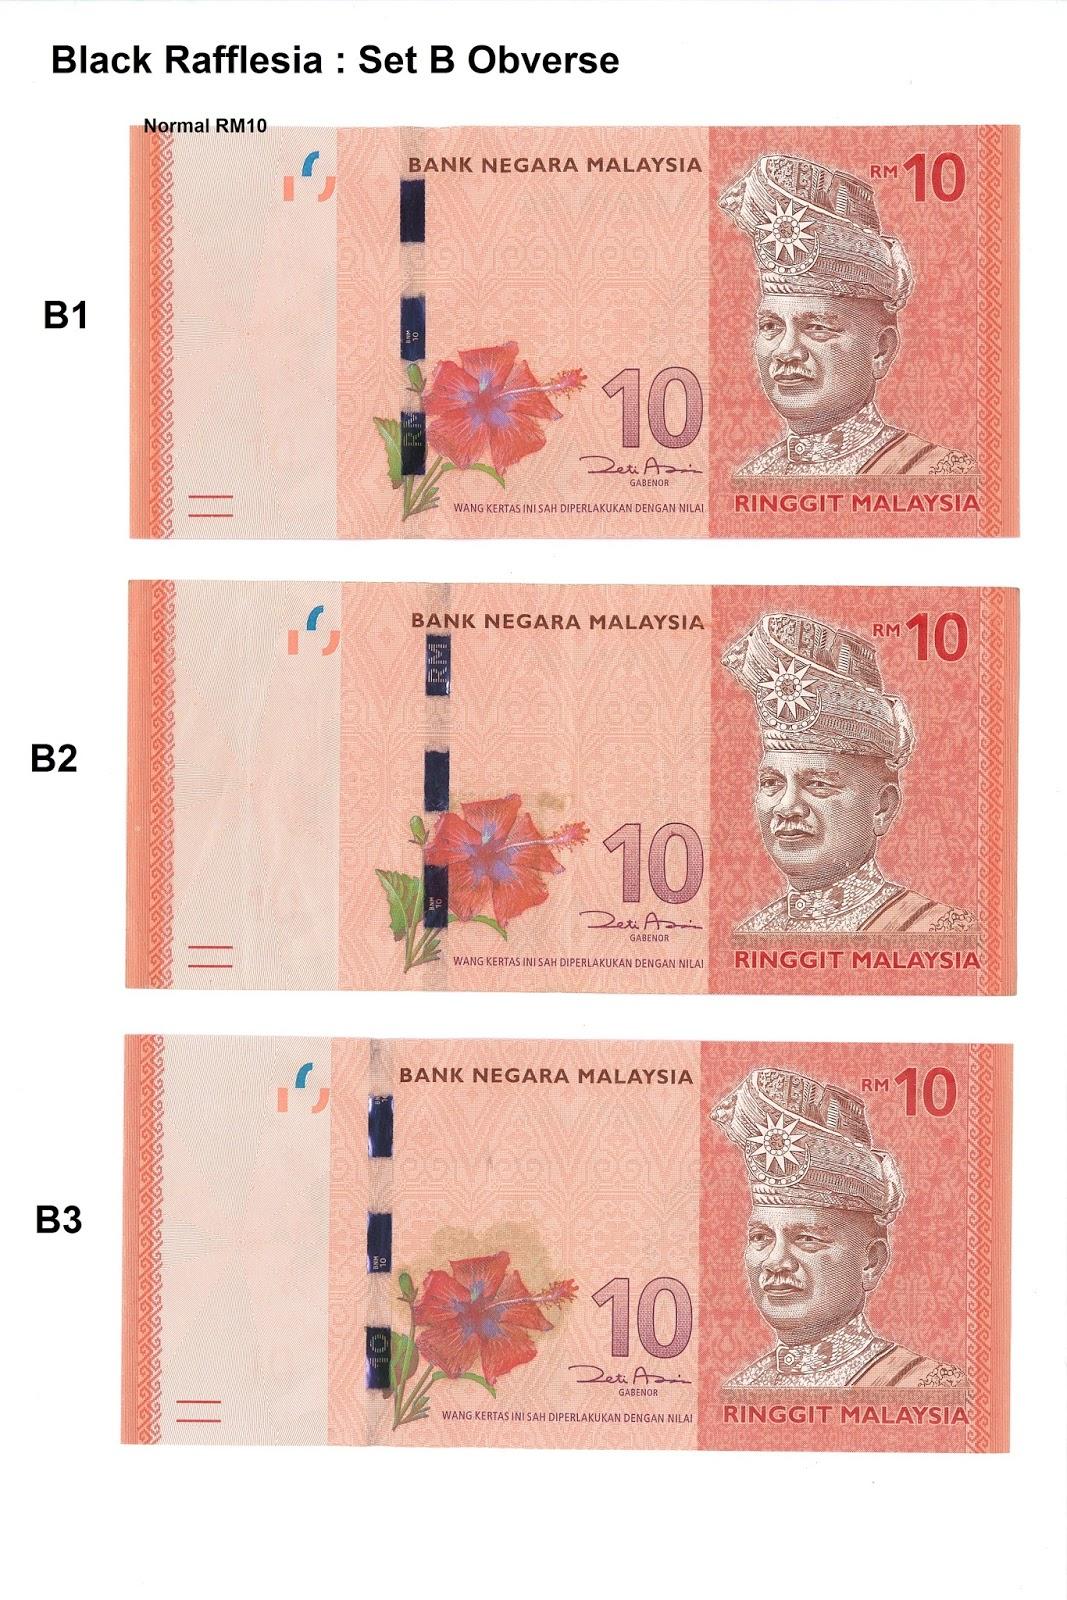 Malaysia 12th Series RM10 Black Rafflesia - Set B Obverse